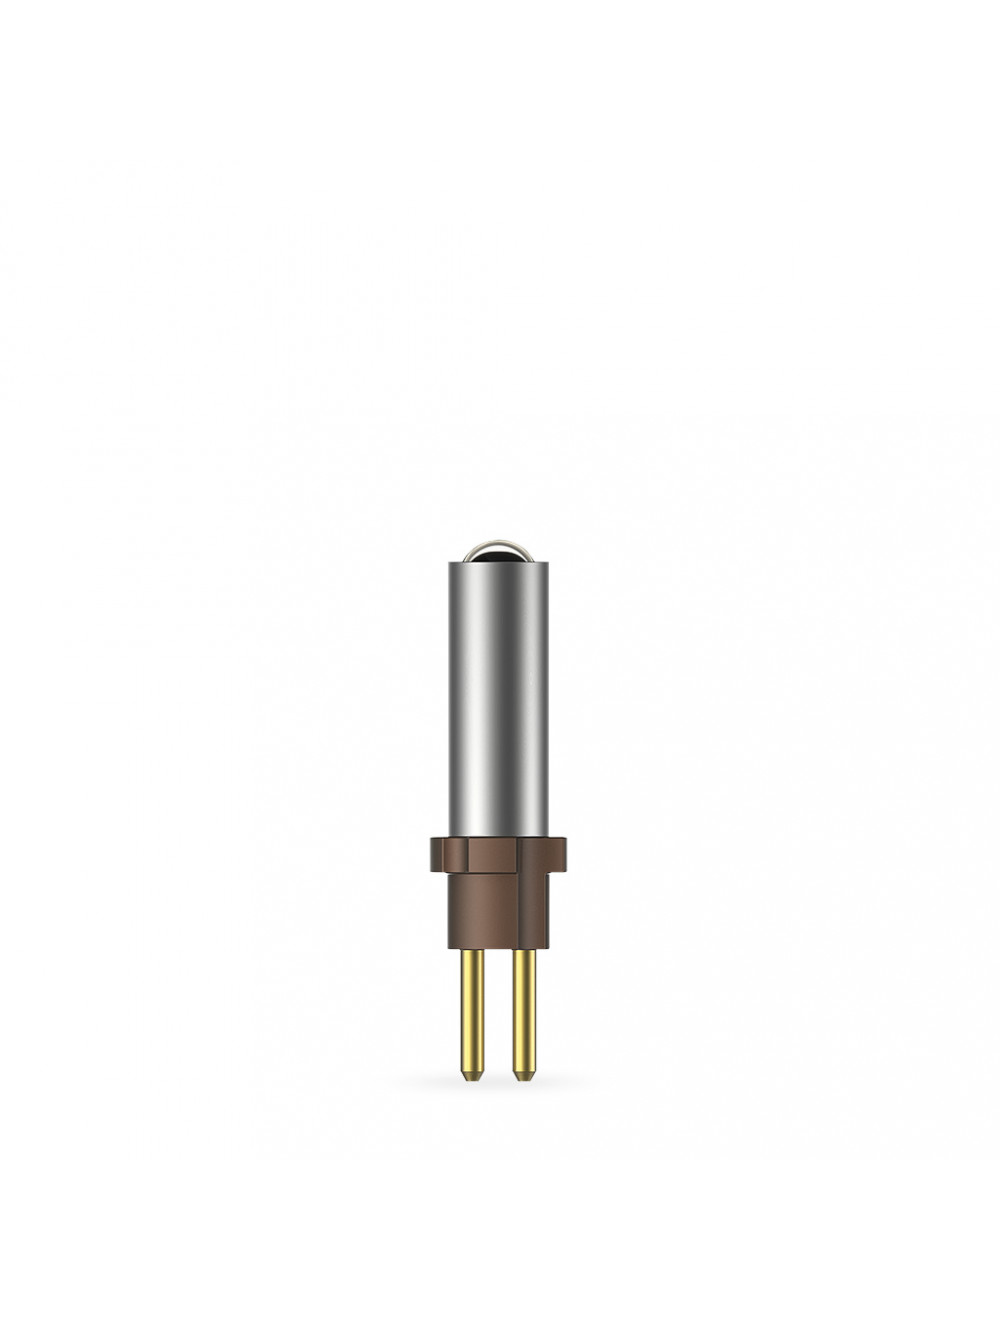 Das Produkt MK-dent Xenon Lampe BU7012ST aus dem Global-dent online shop.